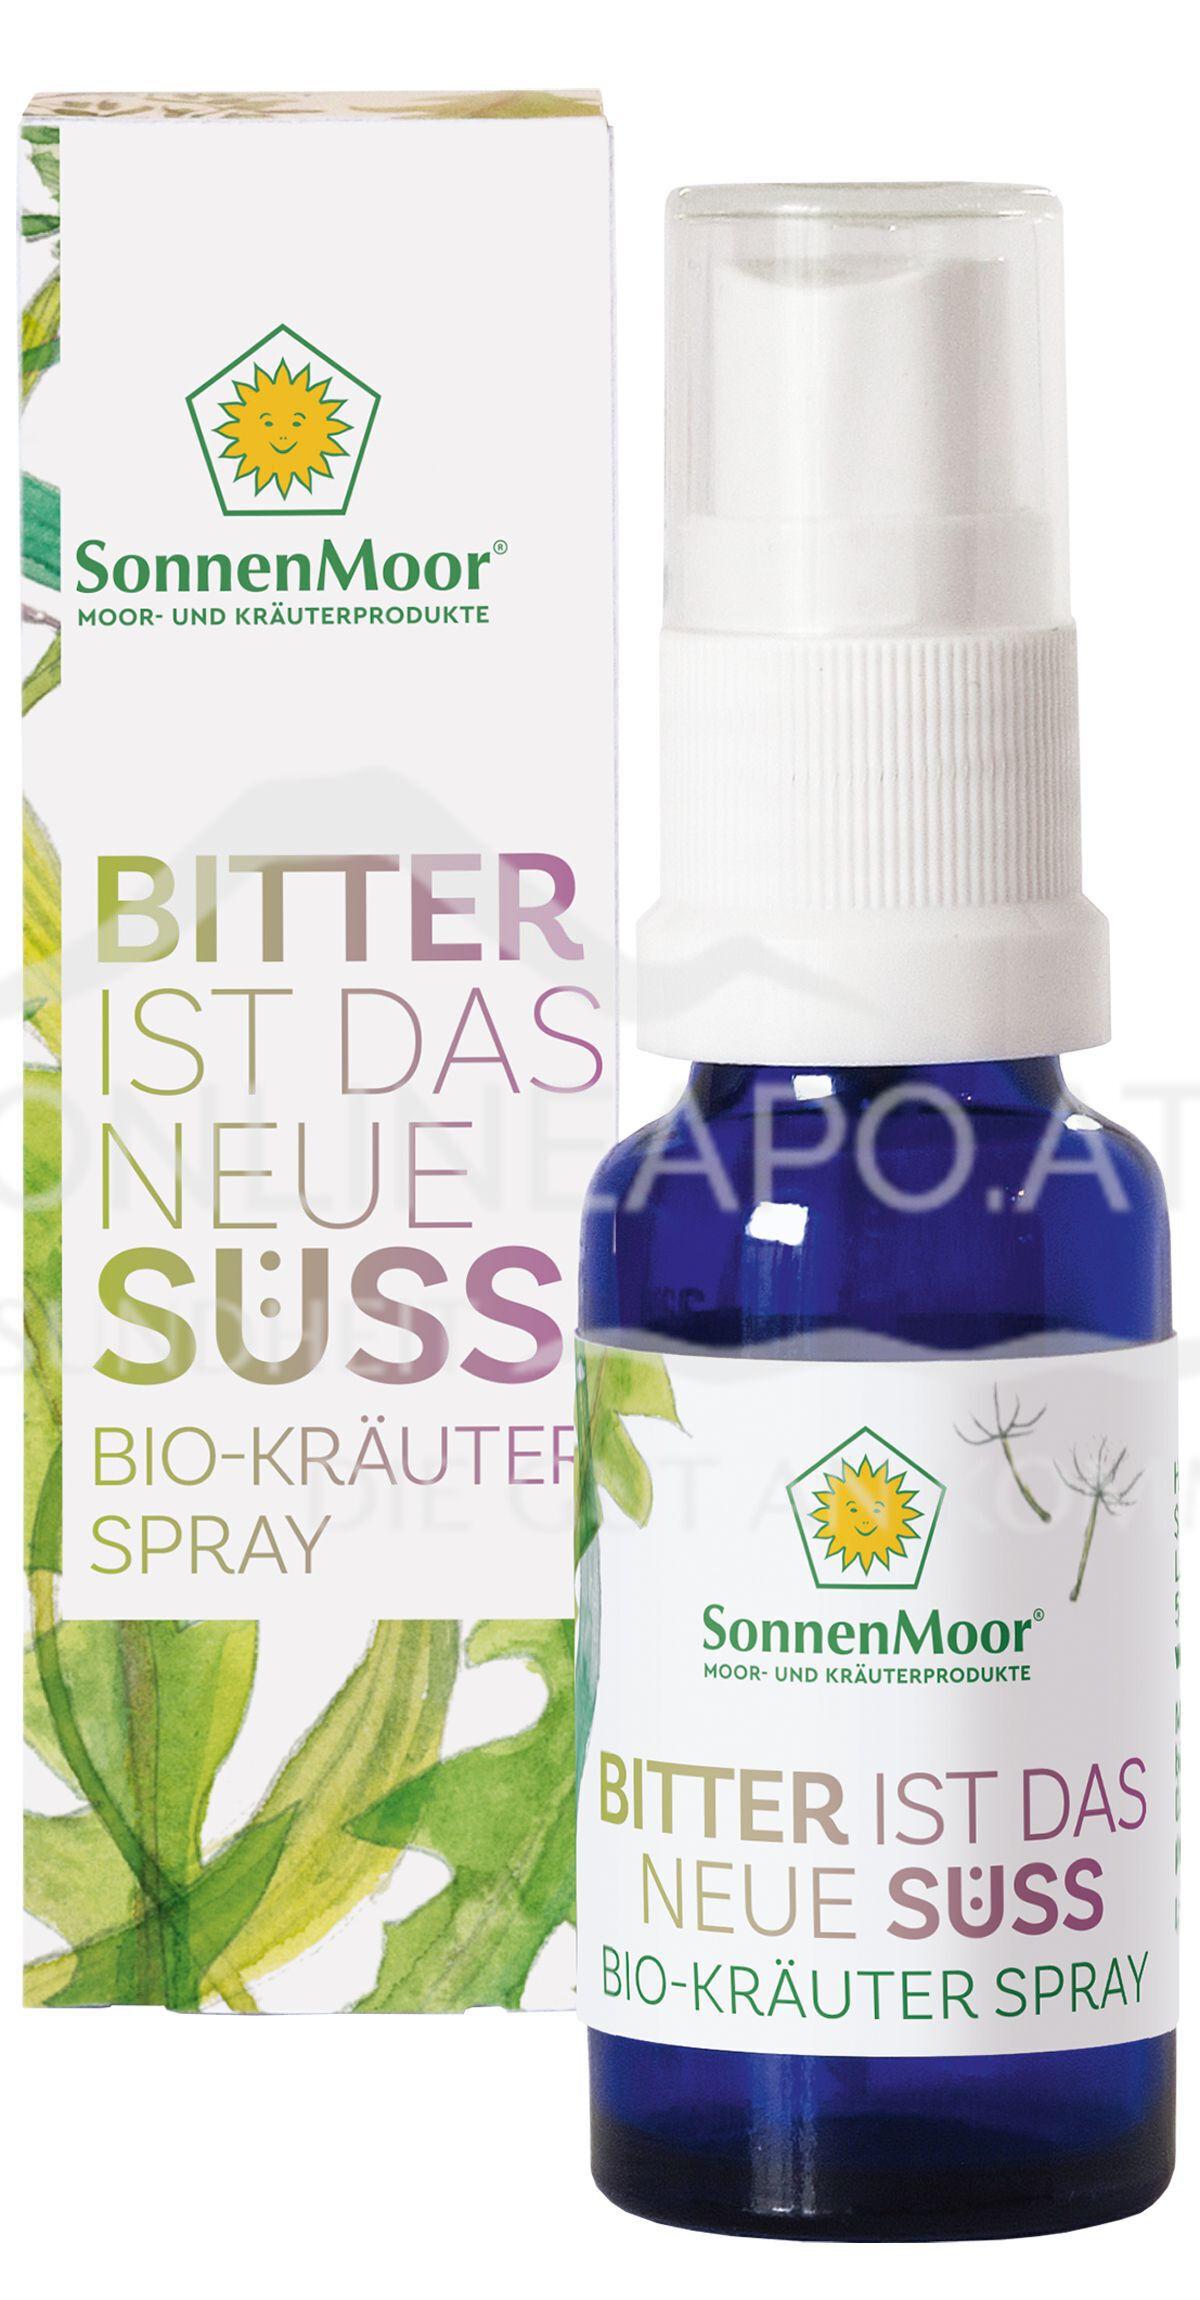 SonnenMoor Bio-Kräuter-Spray